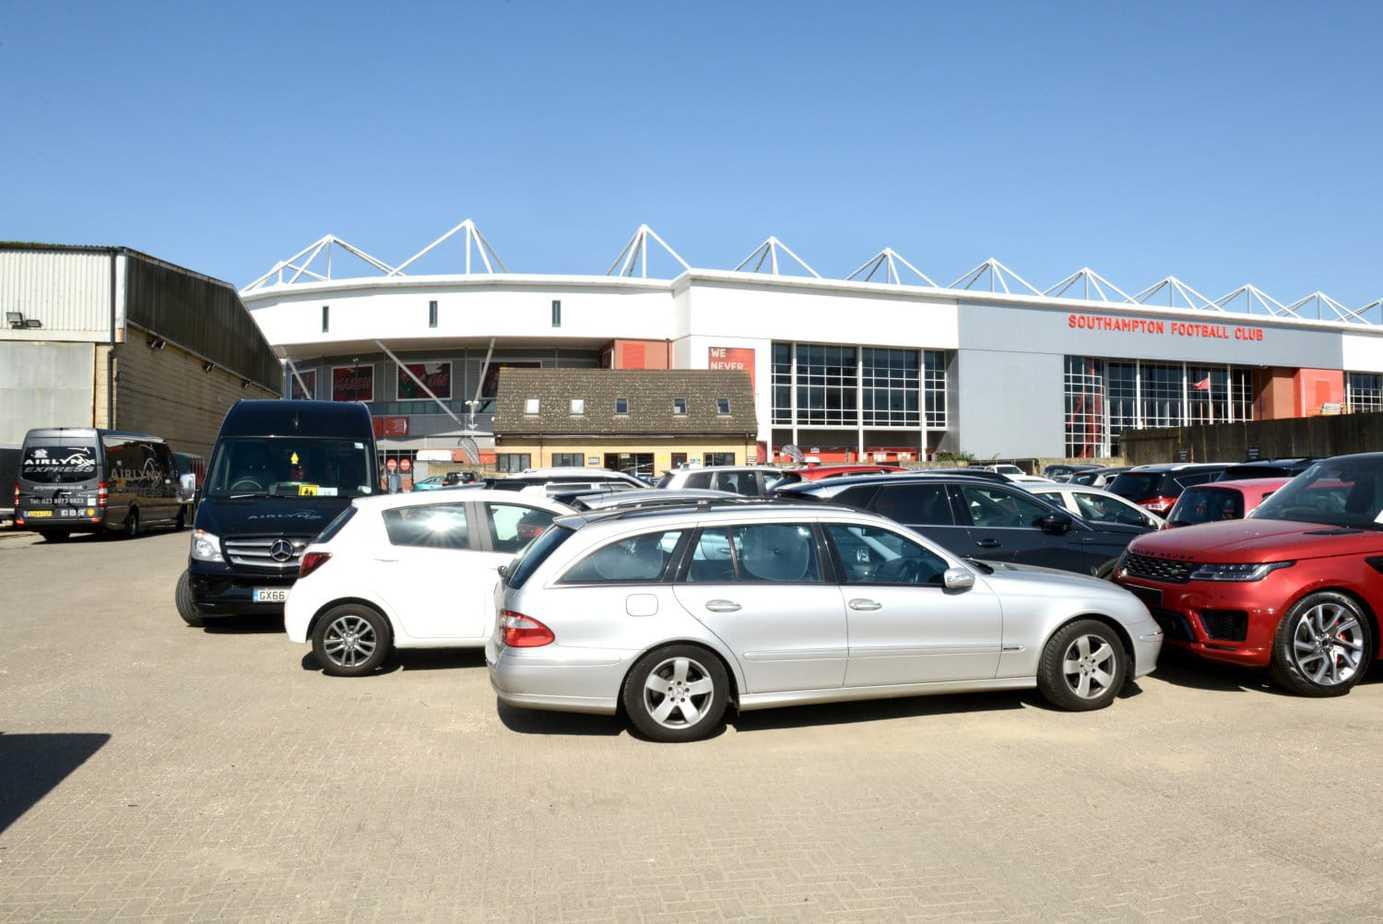 Airlynx Parking at St Mary's Stadium